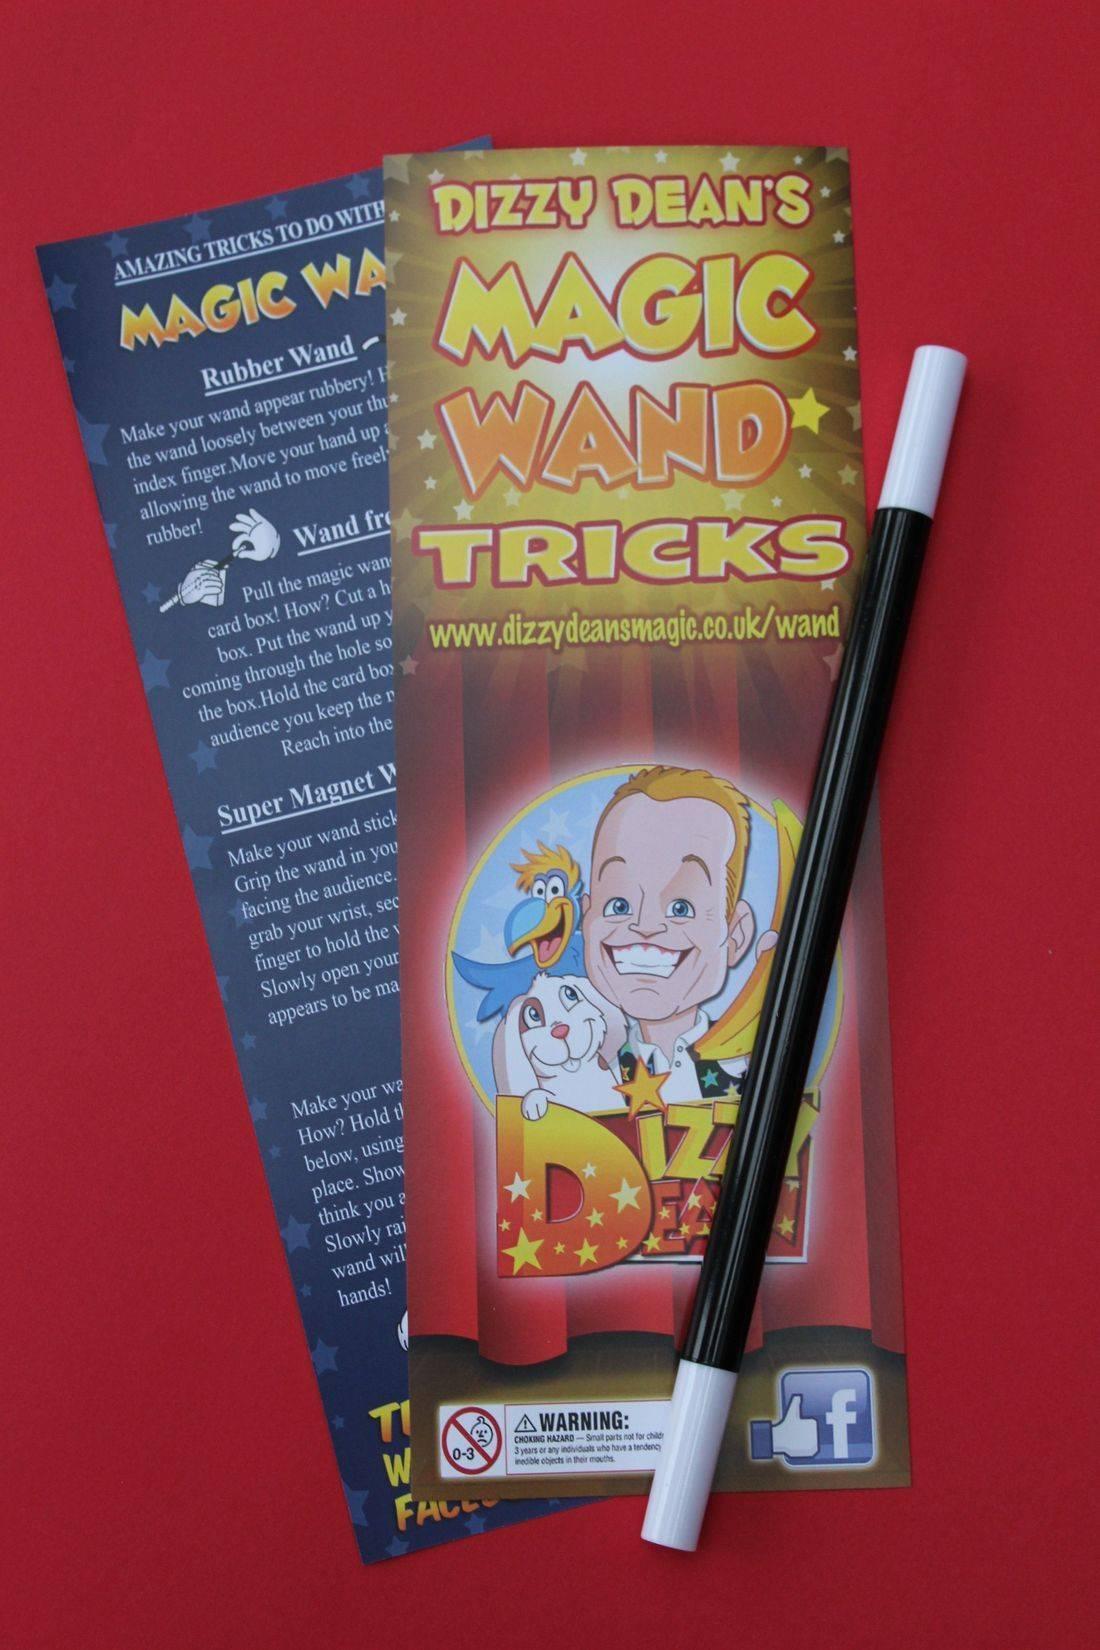 Dizzy Deans Magic Wand Trick